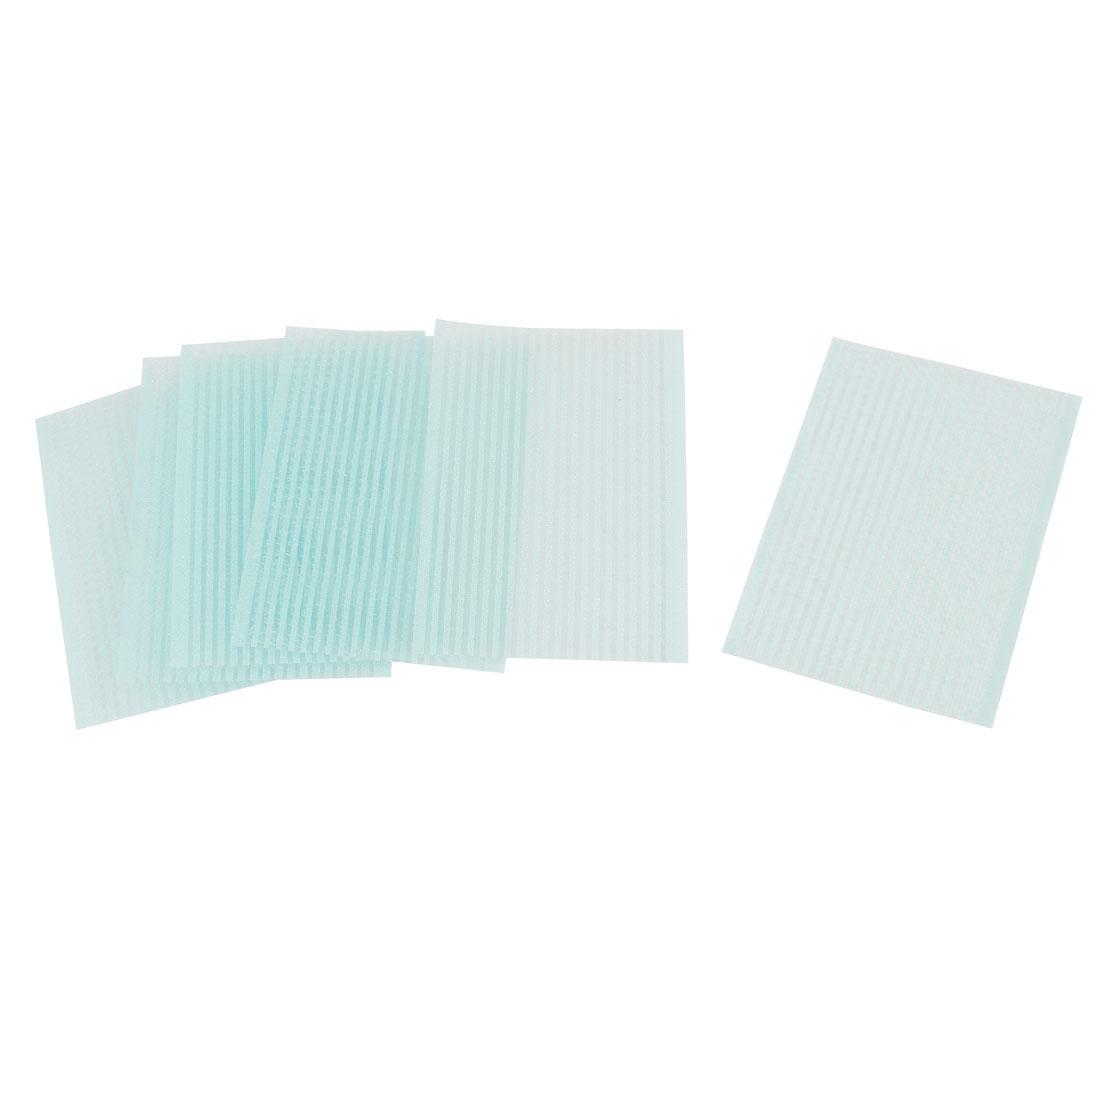 6 pcs Plastic Magic Paste Posts Fringe Hair Bangs Stickers Light Blue